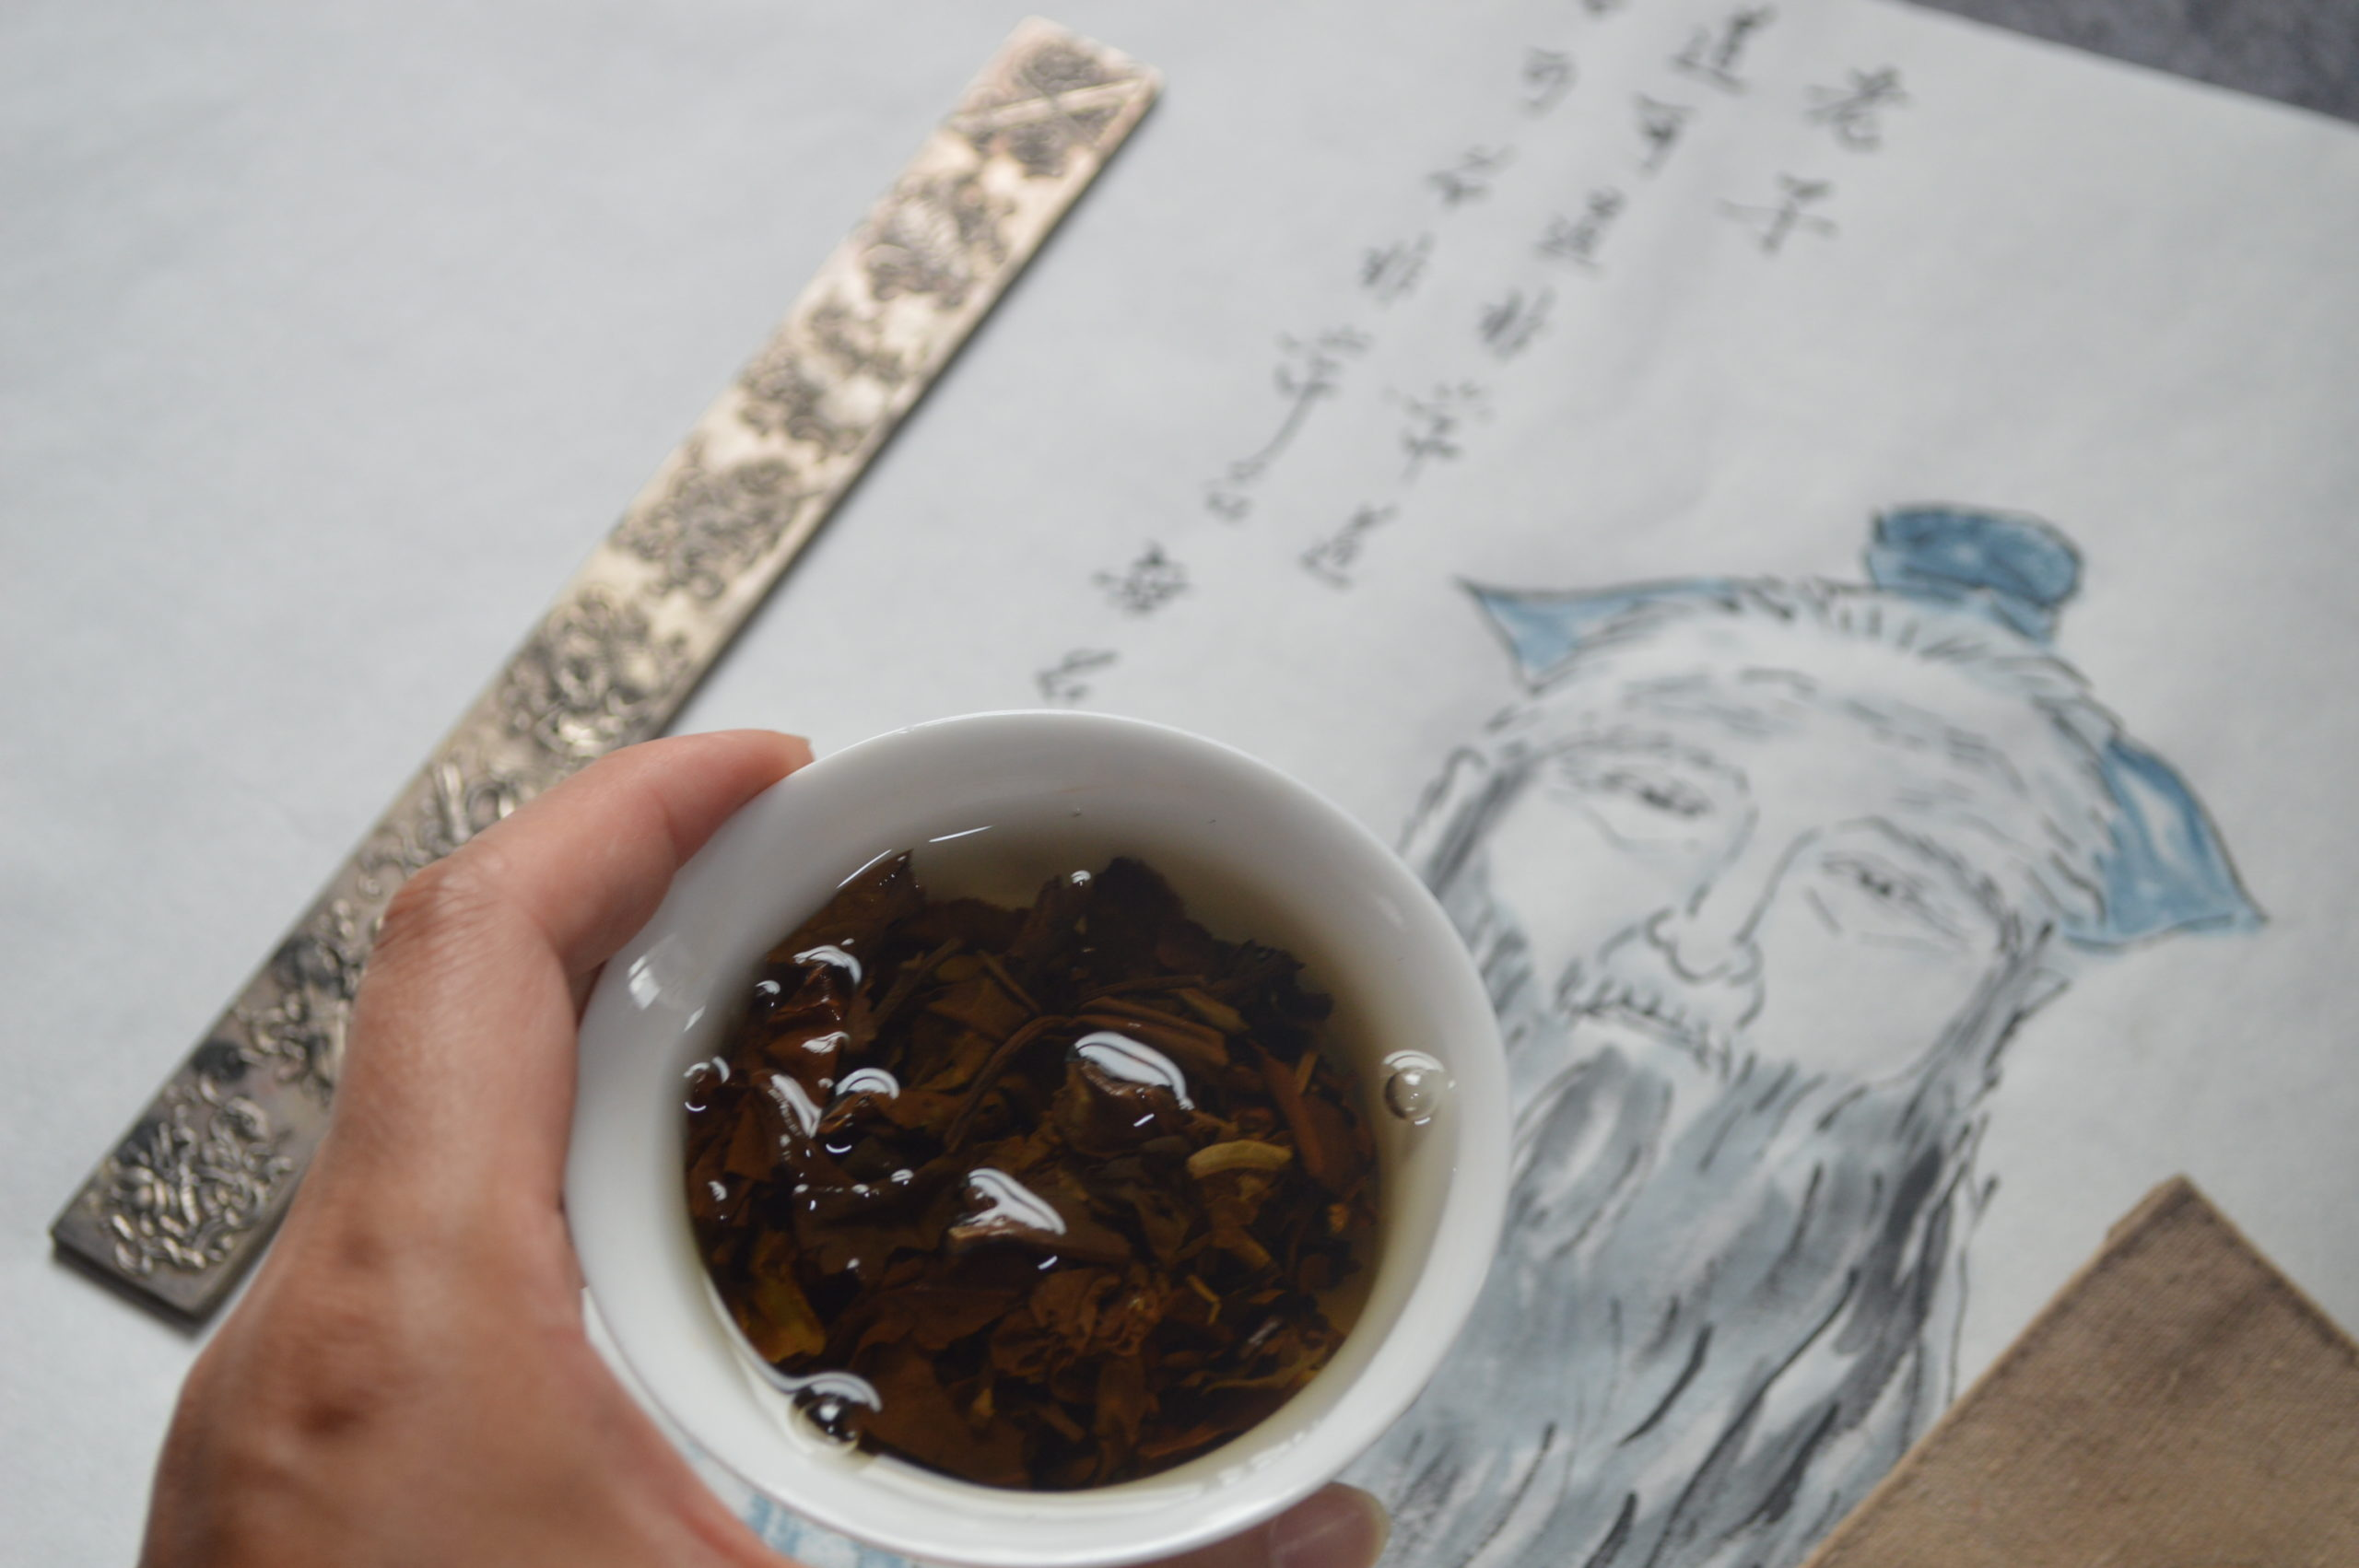 https://shop.liu-tea-art.com/wp-content/uploads/2017/06/DSC_0022-scaled.jpg